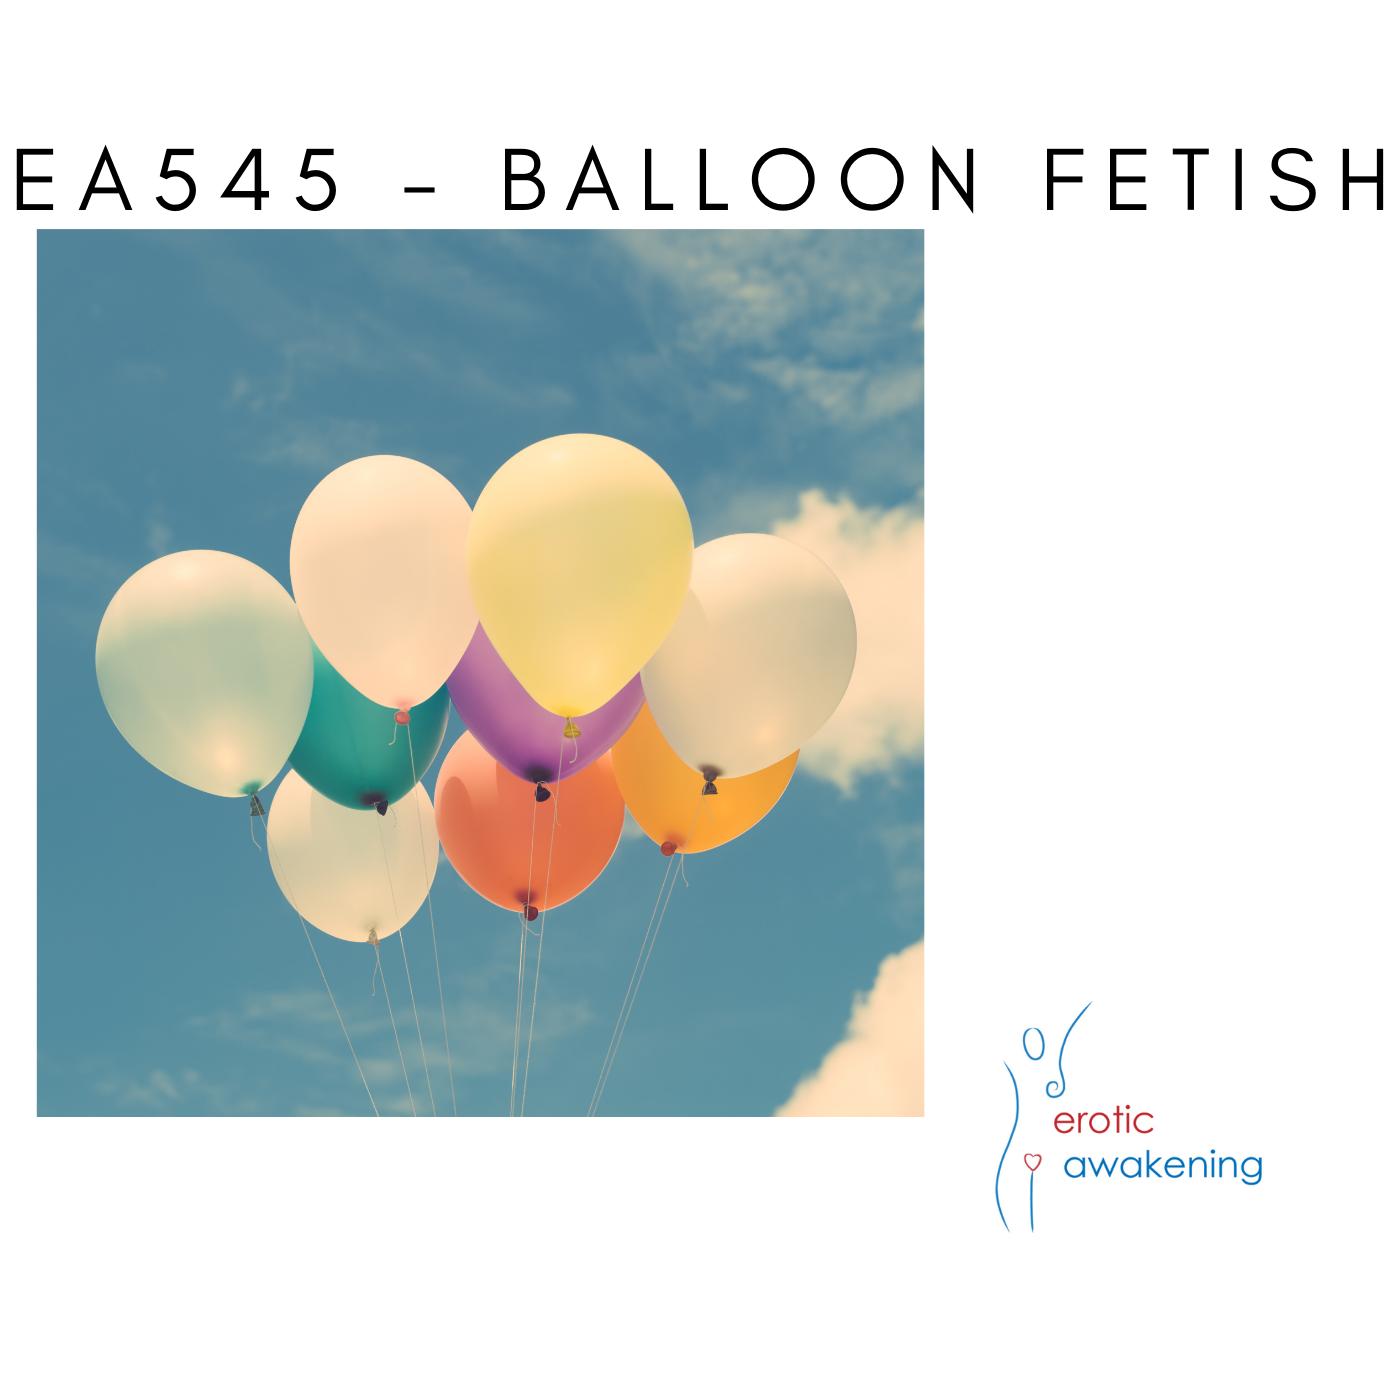 Erotic Awakening Podcast - EA545 - Balloon Fetish